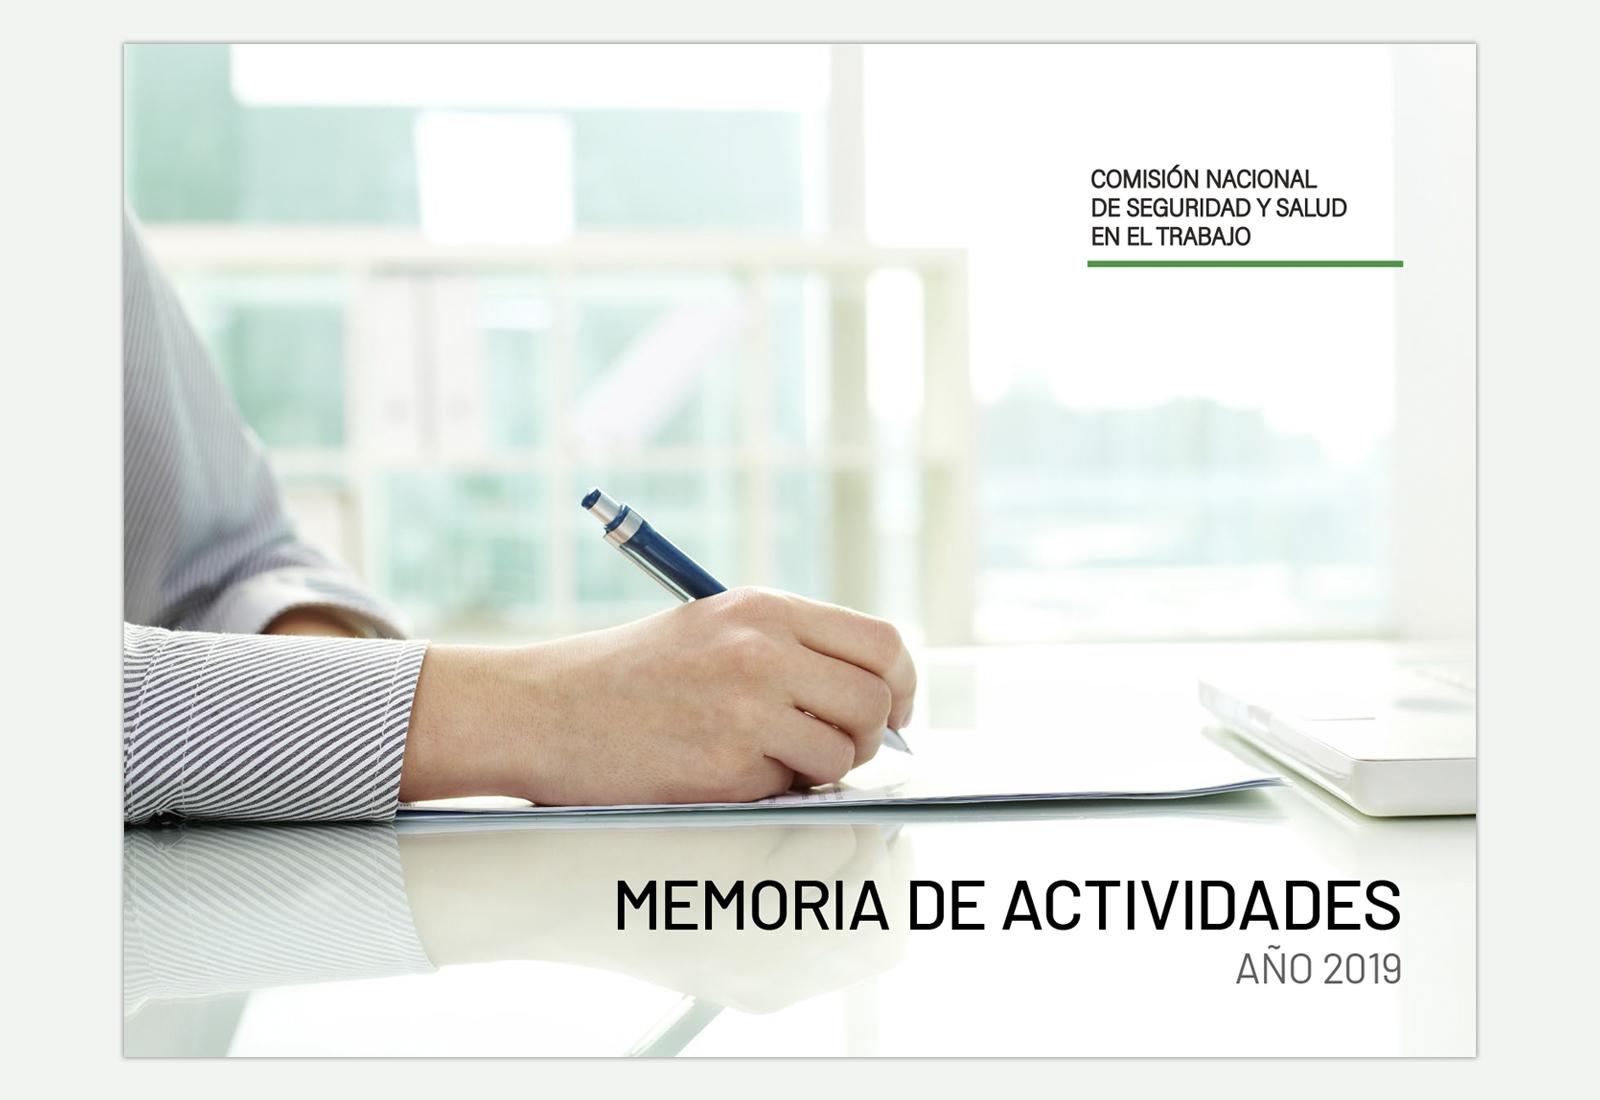 Maquetación memoria actividades 2019 - CNSST